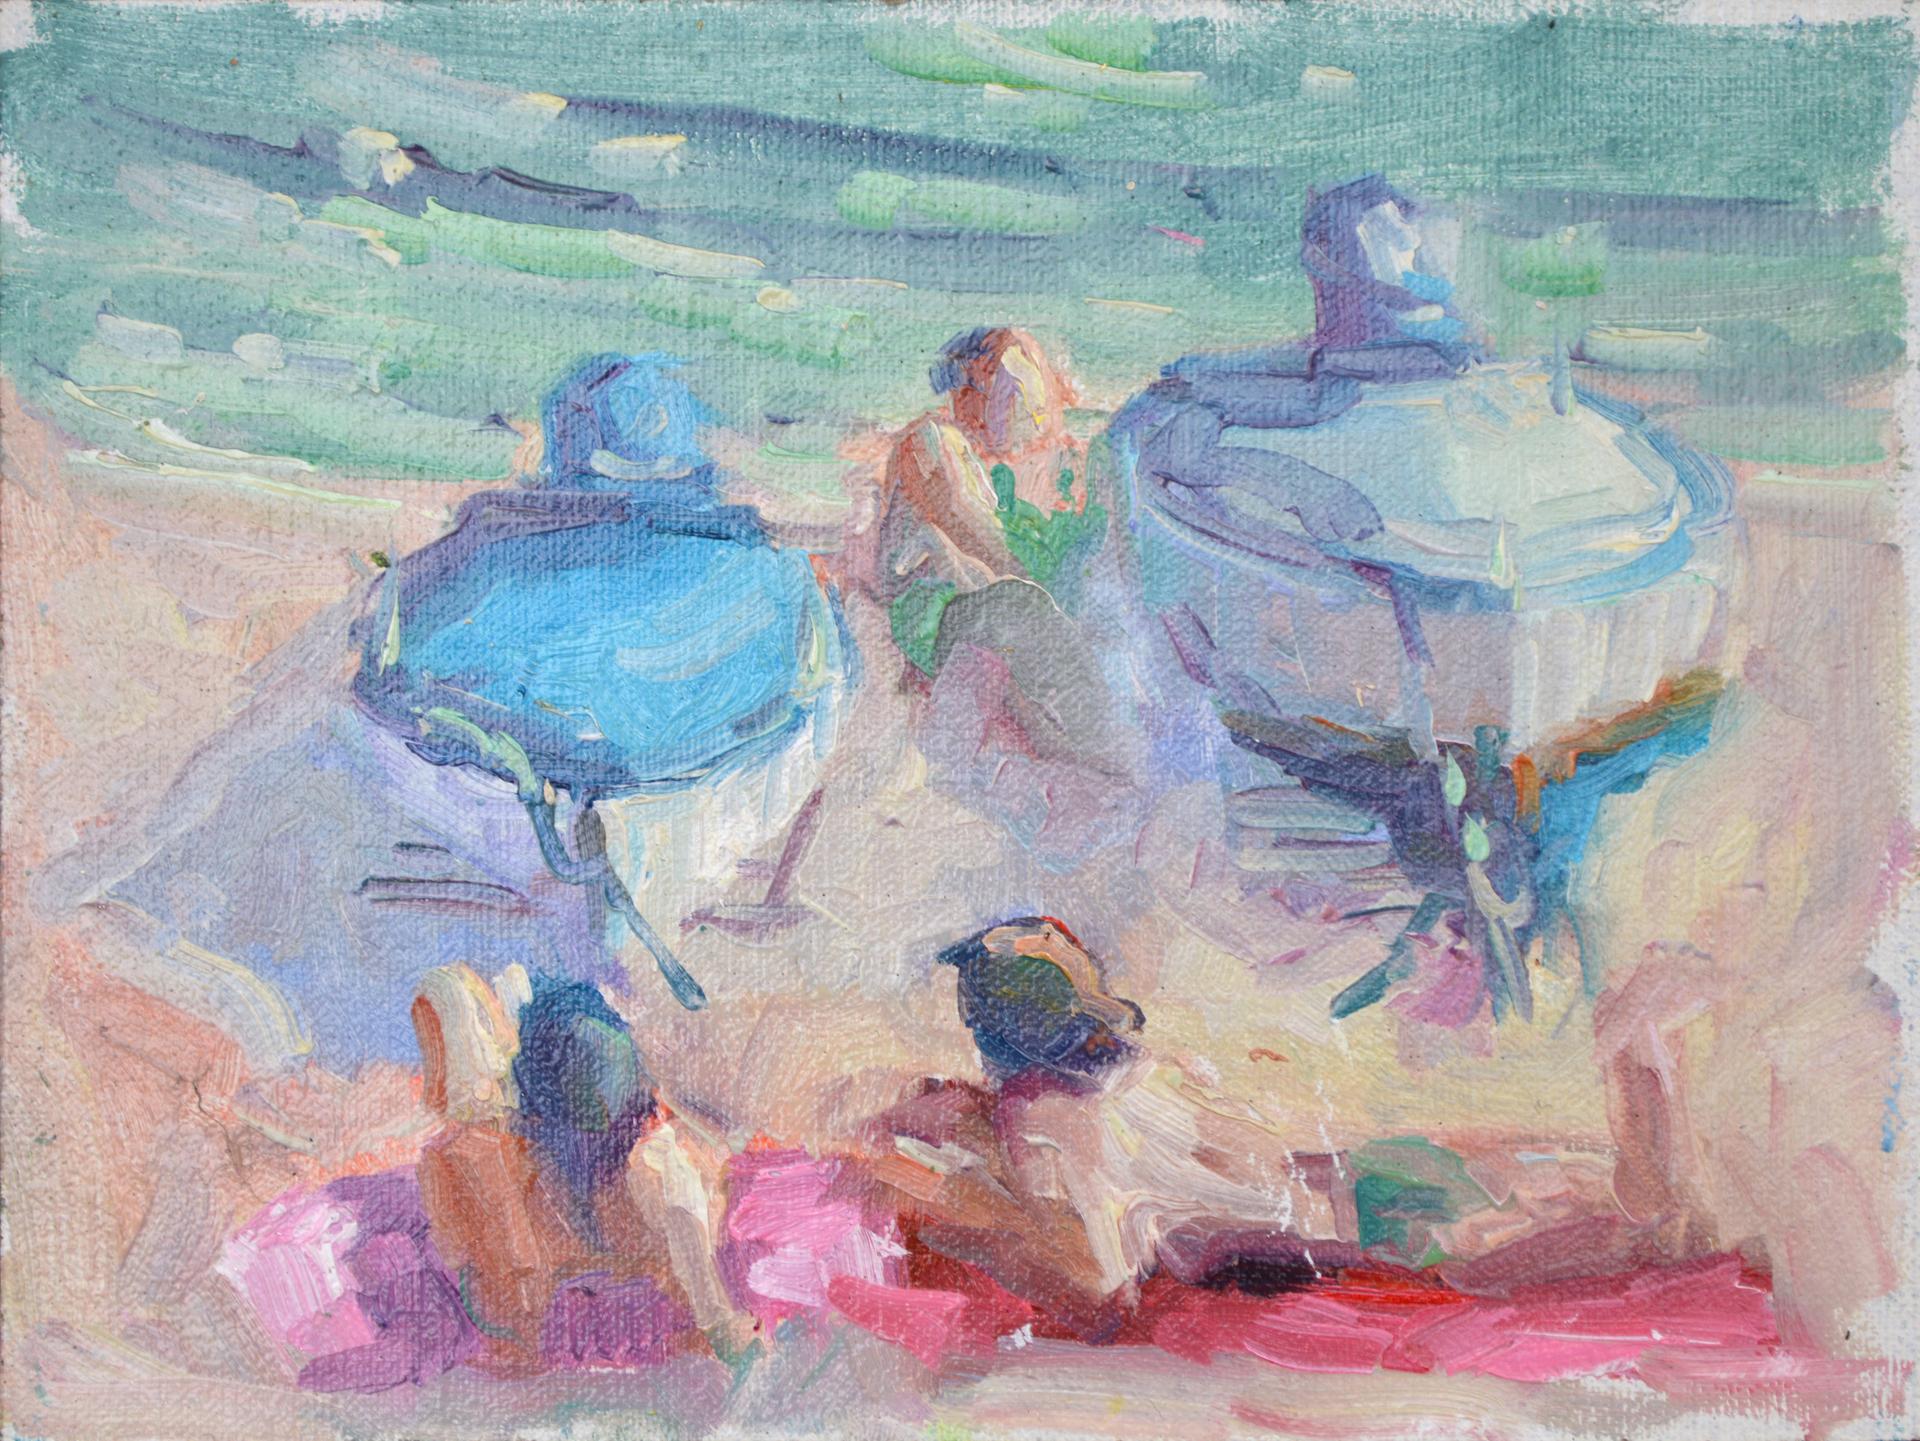 Day at the Beach in Spain by Karen Hewitt Hagan